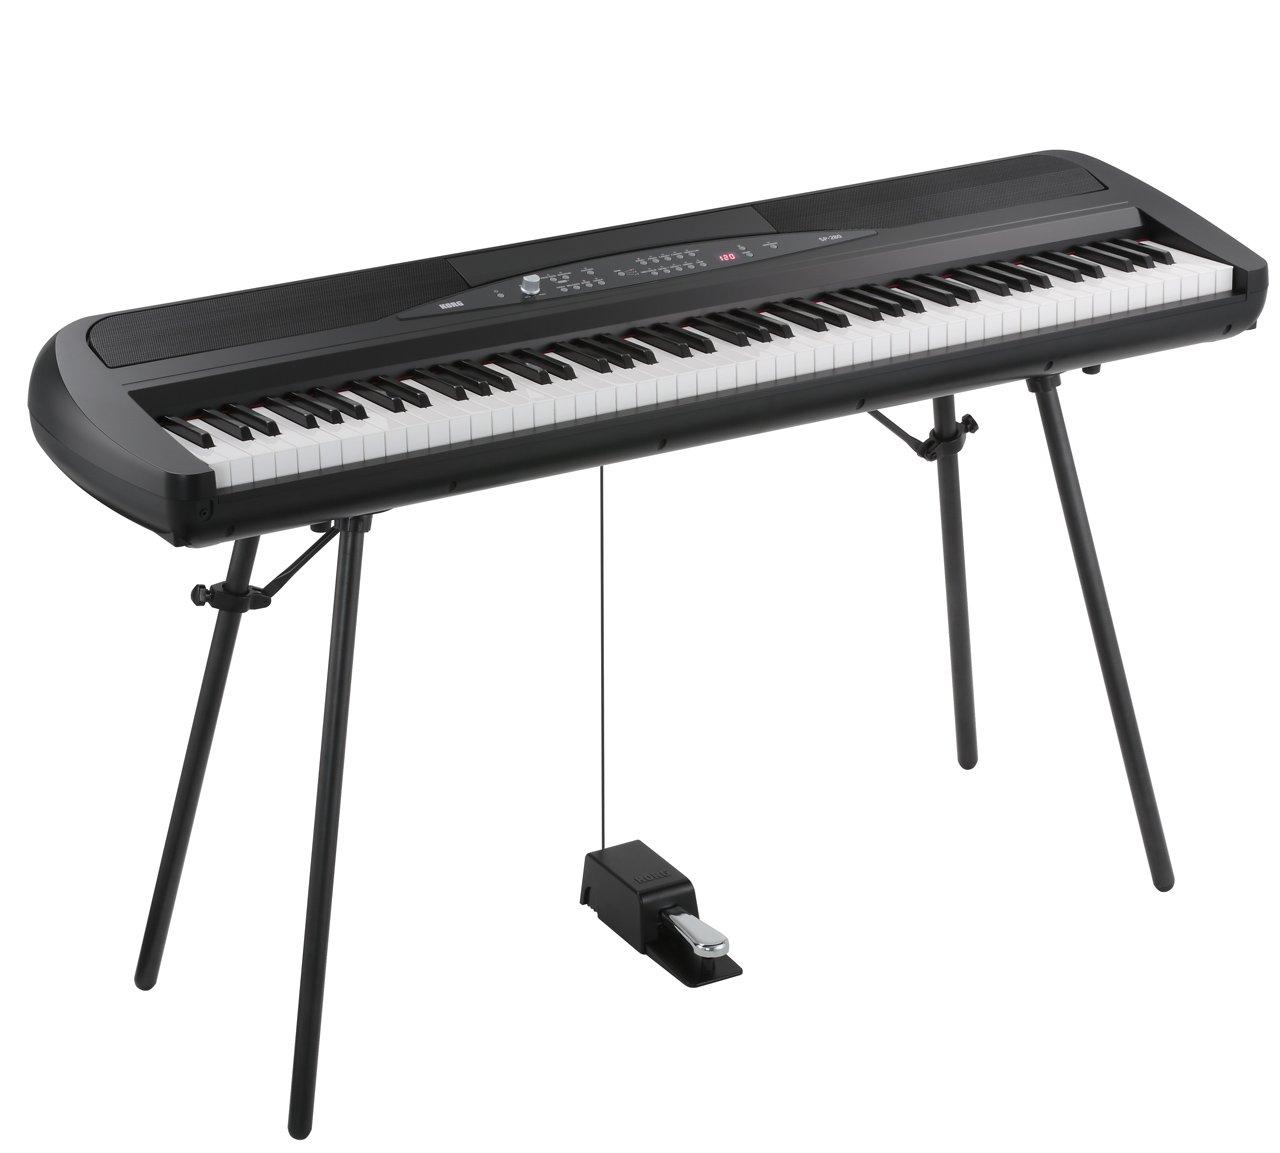 Korg SP280BK 88-Key Digital Piano with Speaker by Korg (Image #3)